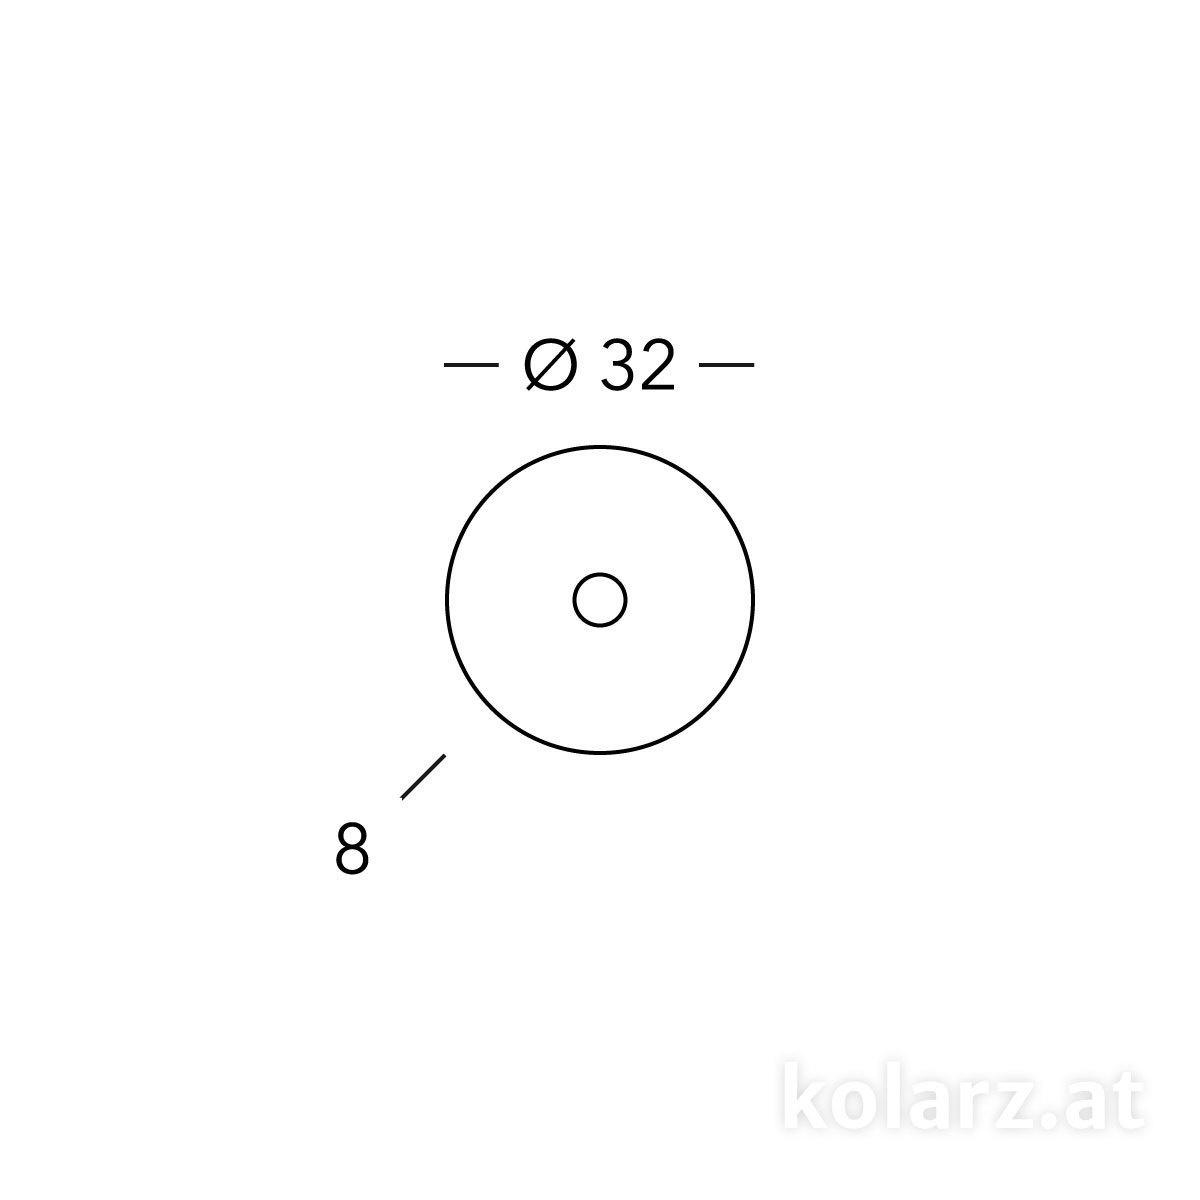 0314-U12-3-W-s1.jpg